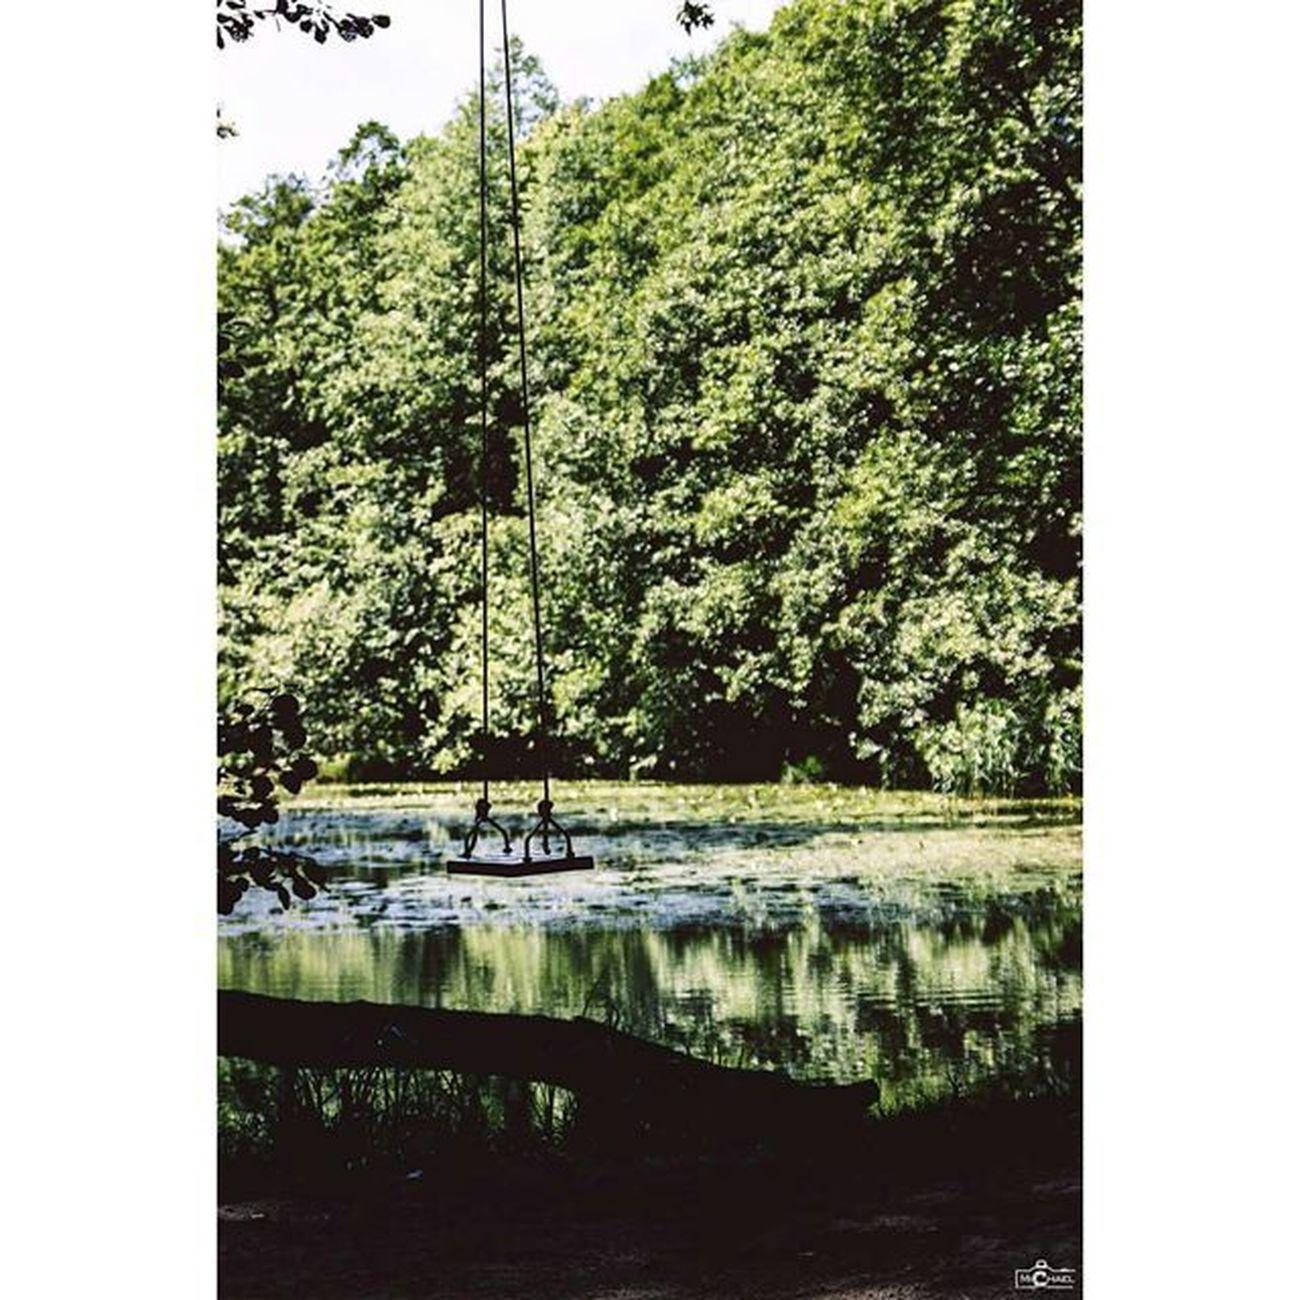 The loneliness Loneliness Swing Earthshoot CripixtMovement Landscape Michaellangerfotografie Fotografie Photography Photographyislife Water Trees Brandenburg Germany